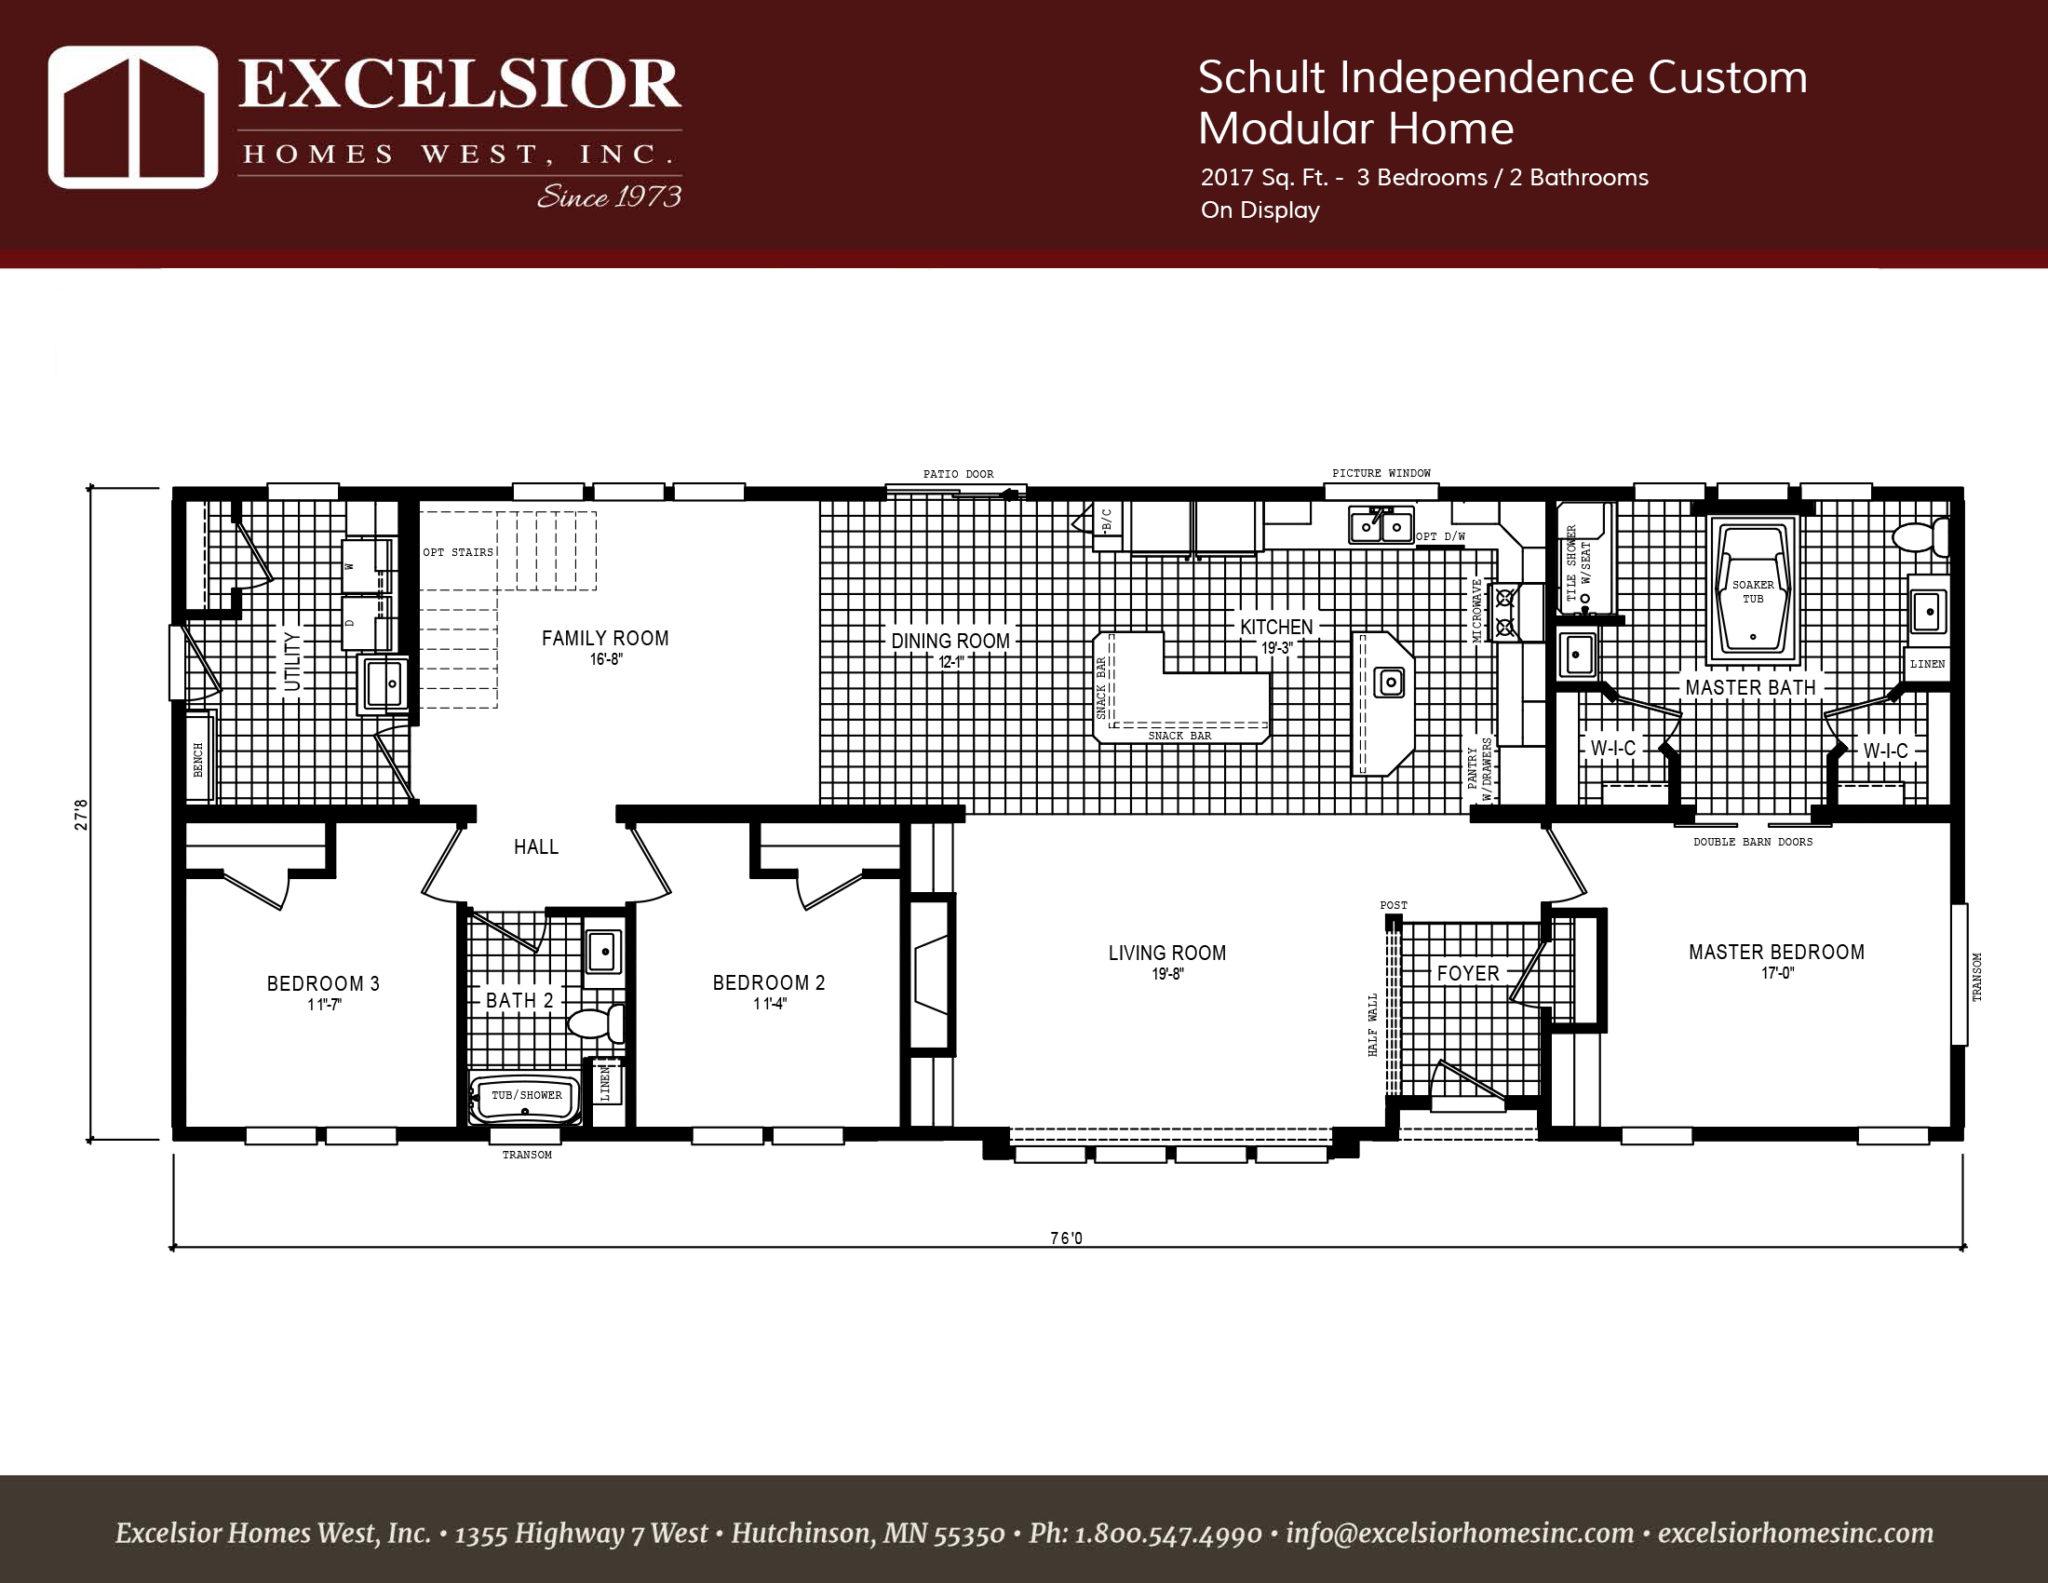 Schult Independence Custom Modular Home  Excelsior Homes